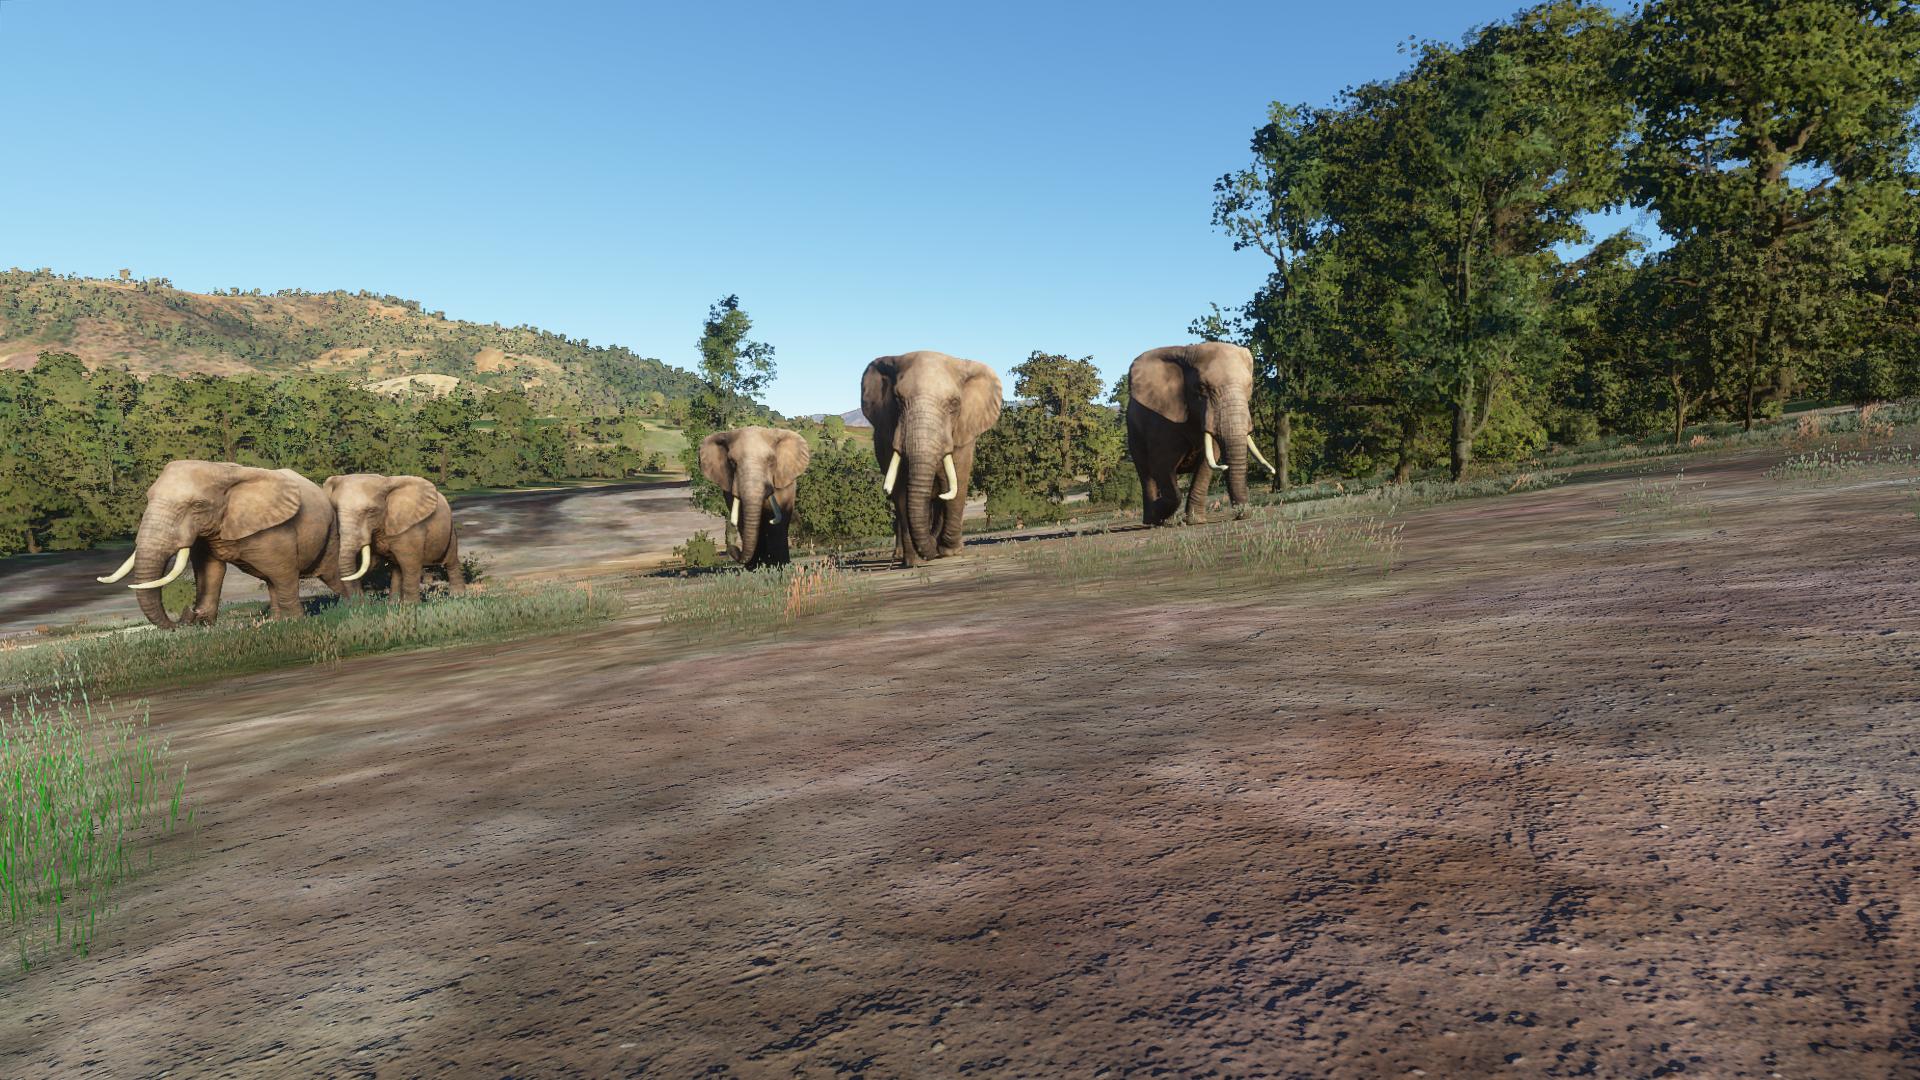 Elephants in Microsoft Flight Simulator